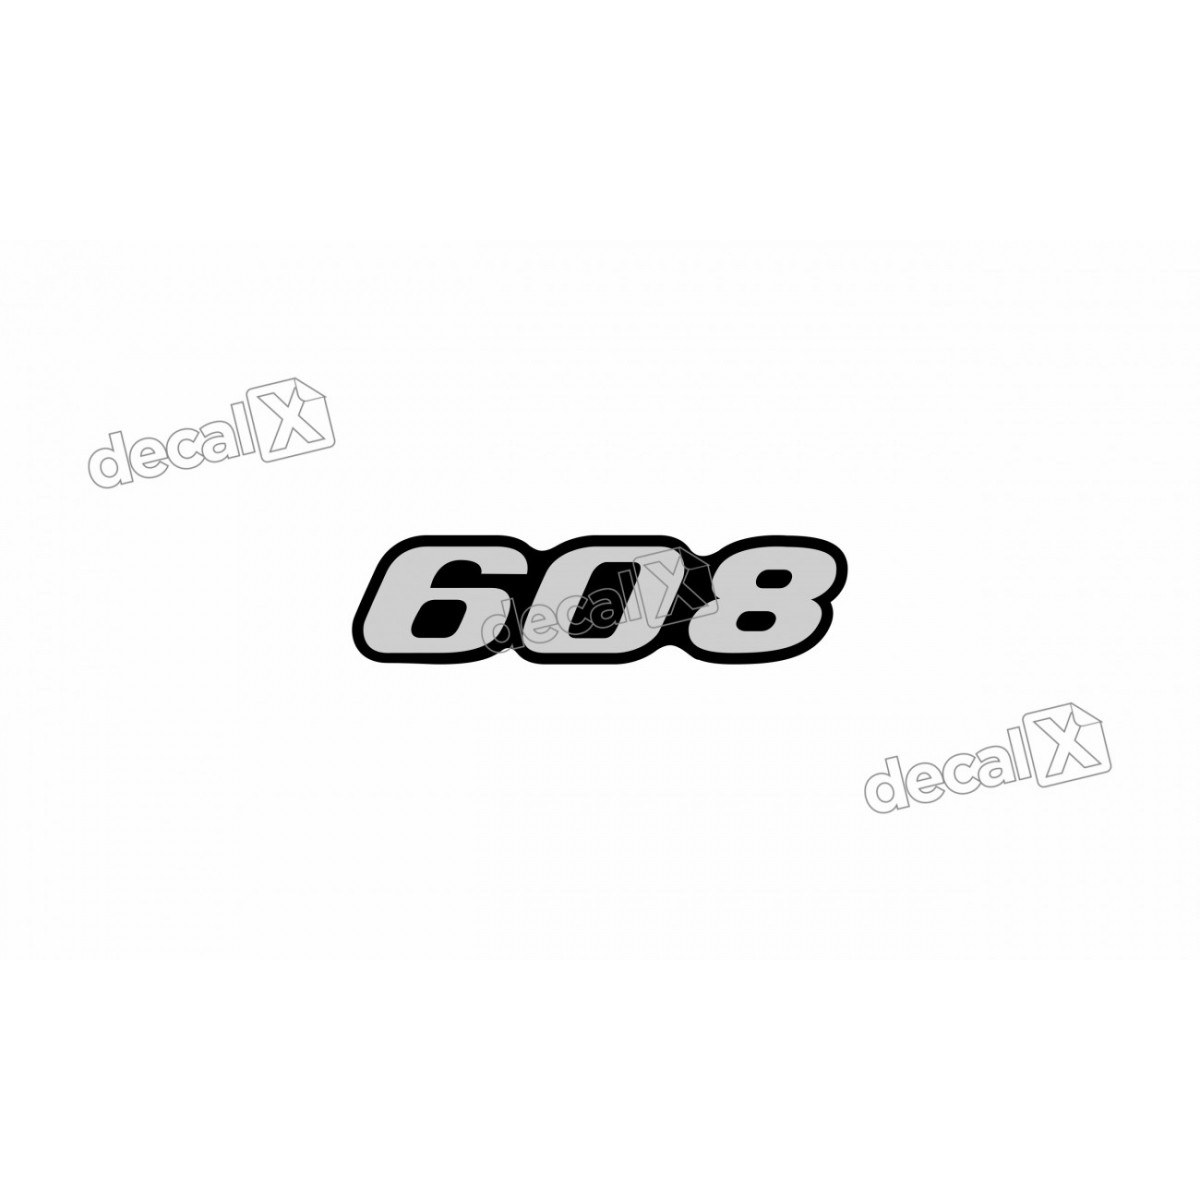 Adesivo Emblema Resinado Mercedes 608 Cm2 Decalx